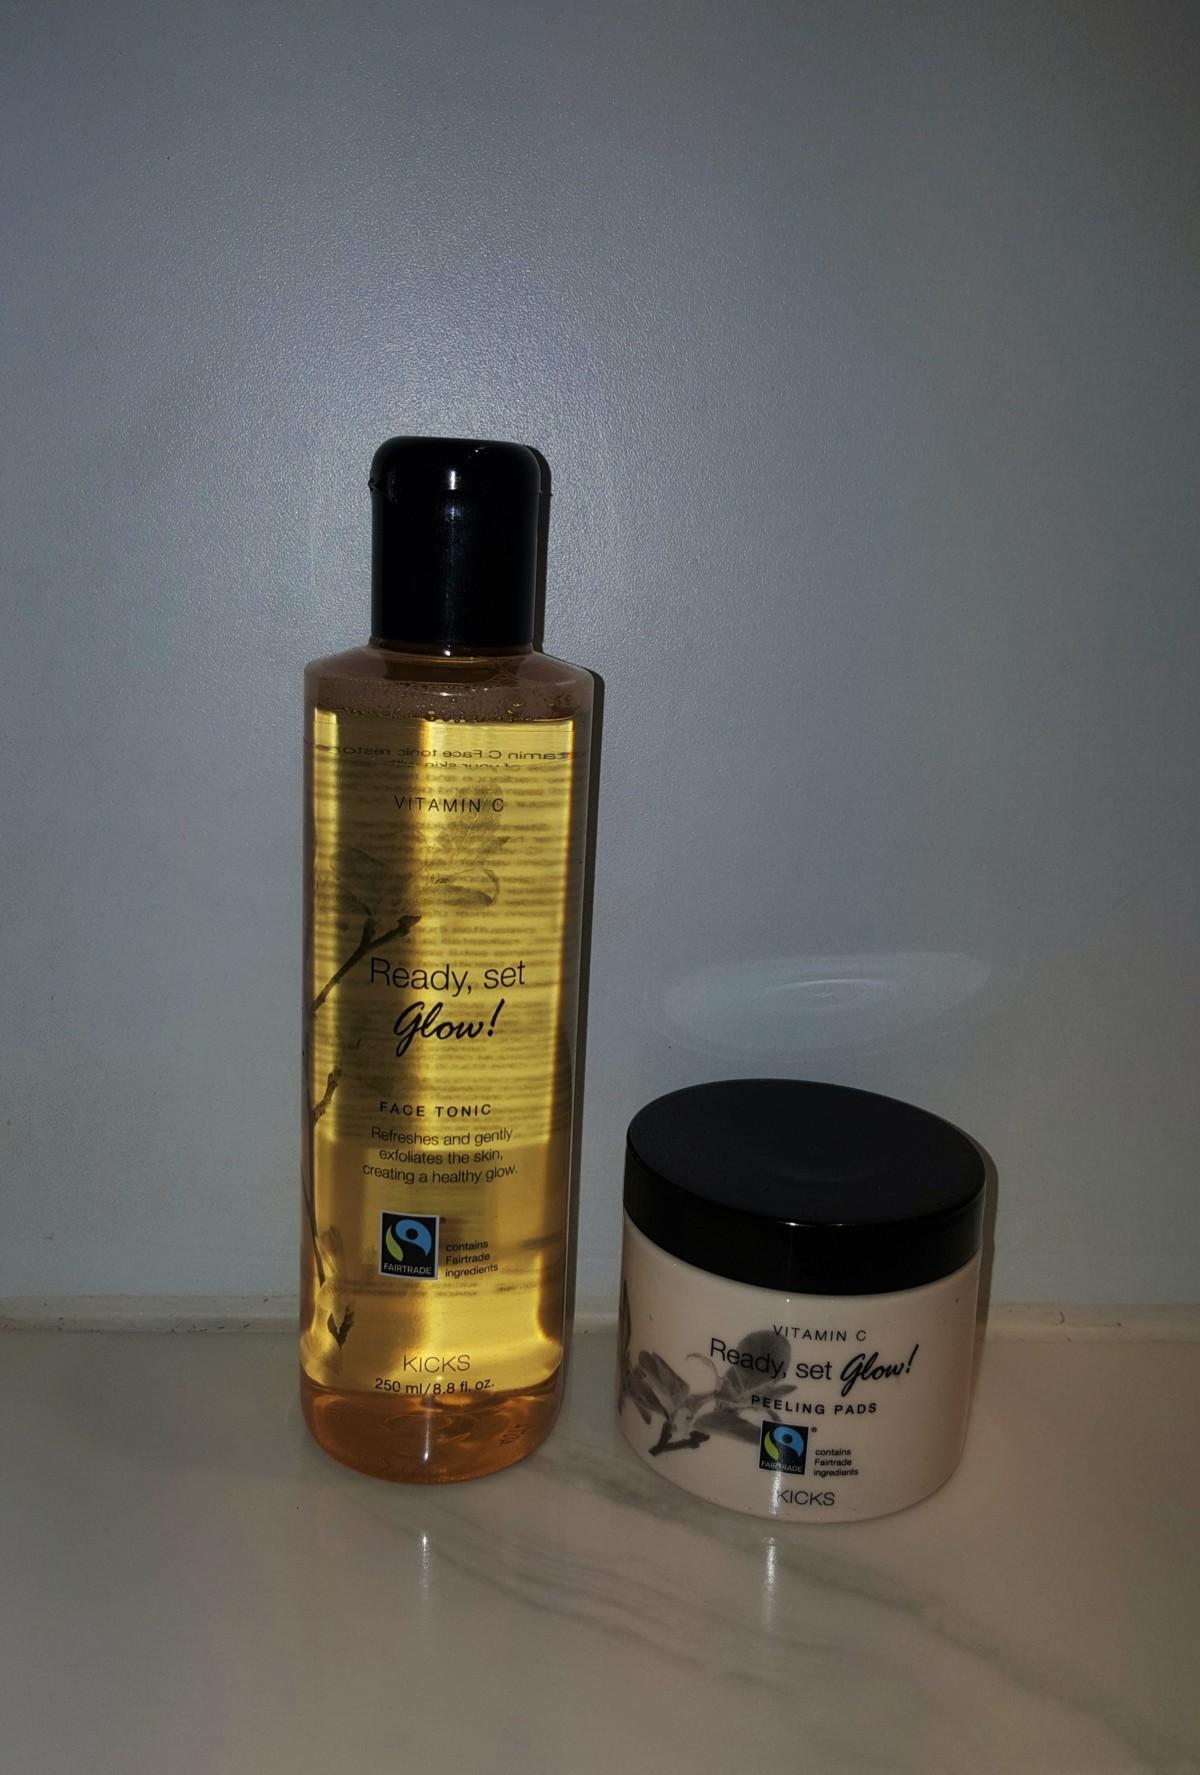 pakke-newin-new-kicks-shopping-shop-innkjøp-isalicious-produkter-hudprodukter-hud-skincare-skincareroutine-hudpleie-hudpleierutine-products-facetoner-toner-peeling-vitaminc-glow-peelingpads-sensitivhud-sensitiveskin